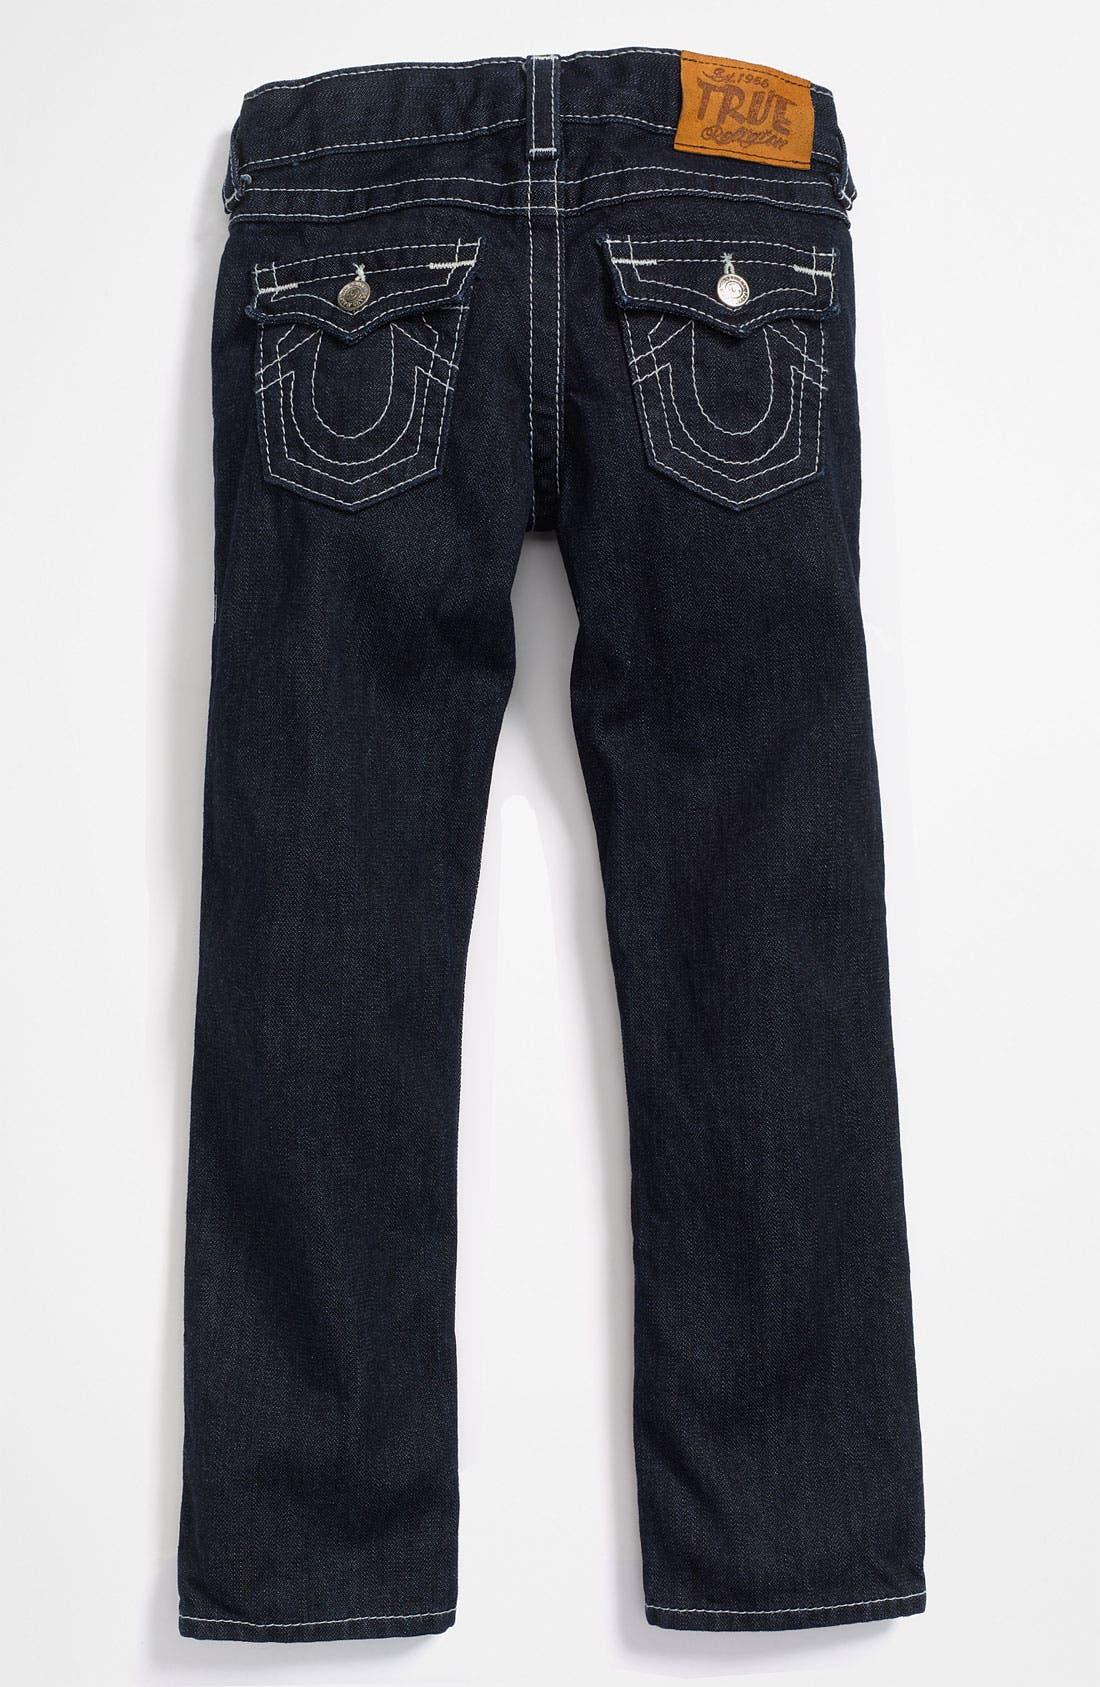 Alternate Image 1 Selected - True Religion Brand Jeans 'Jack' Straight Leg Jeans (Toddler)